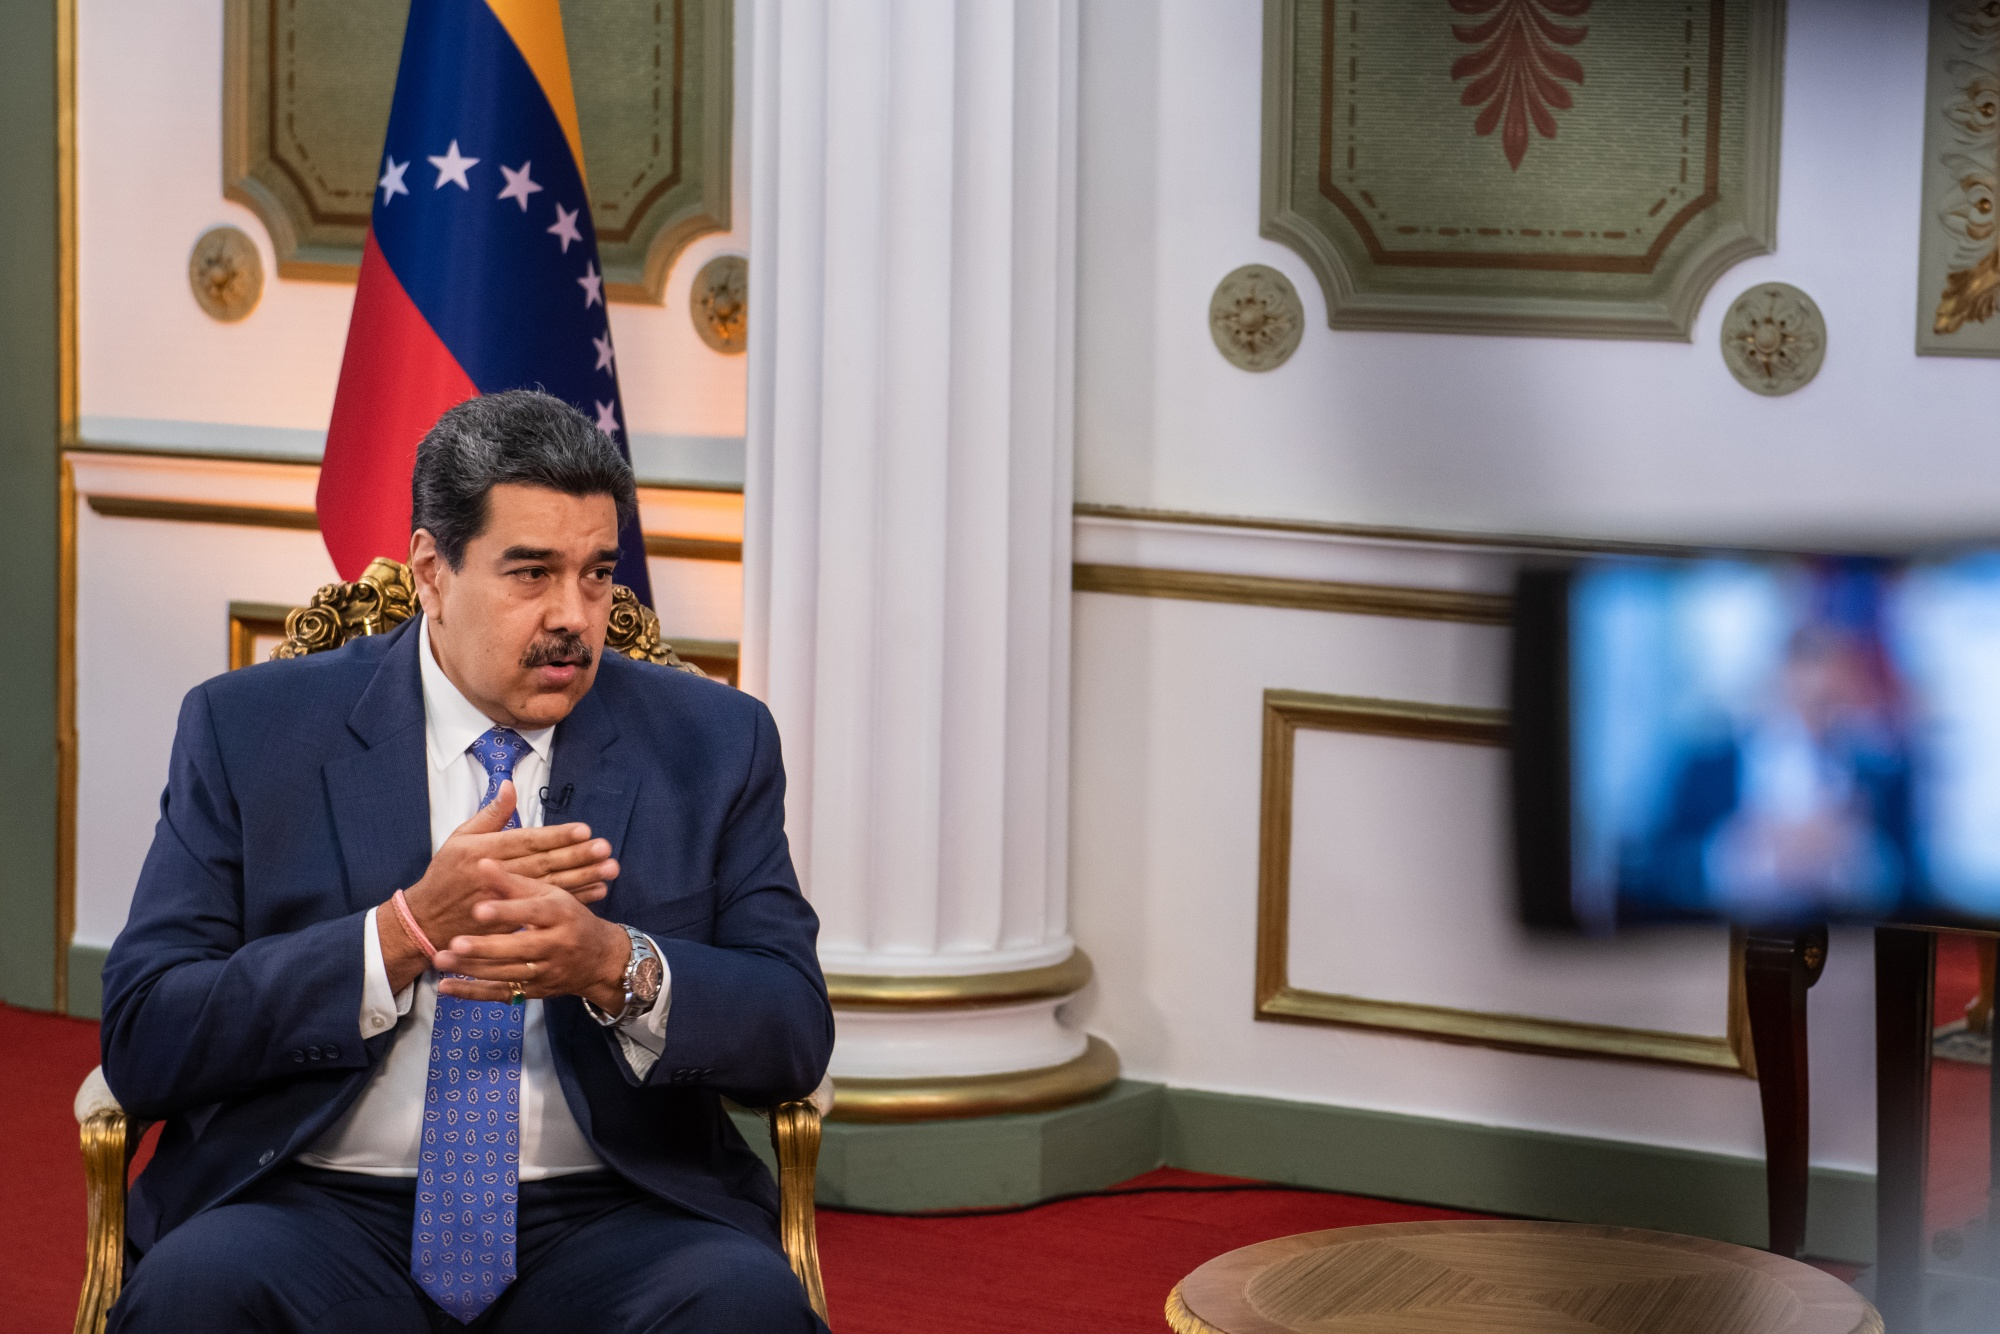 relates to Venezuela President Maduro Talks Sanctions, Economy: Transcript